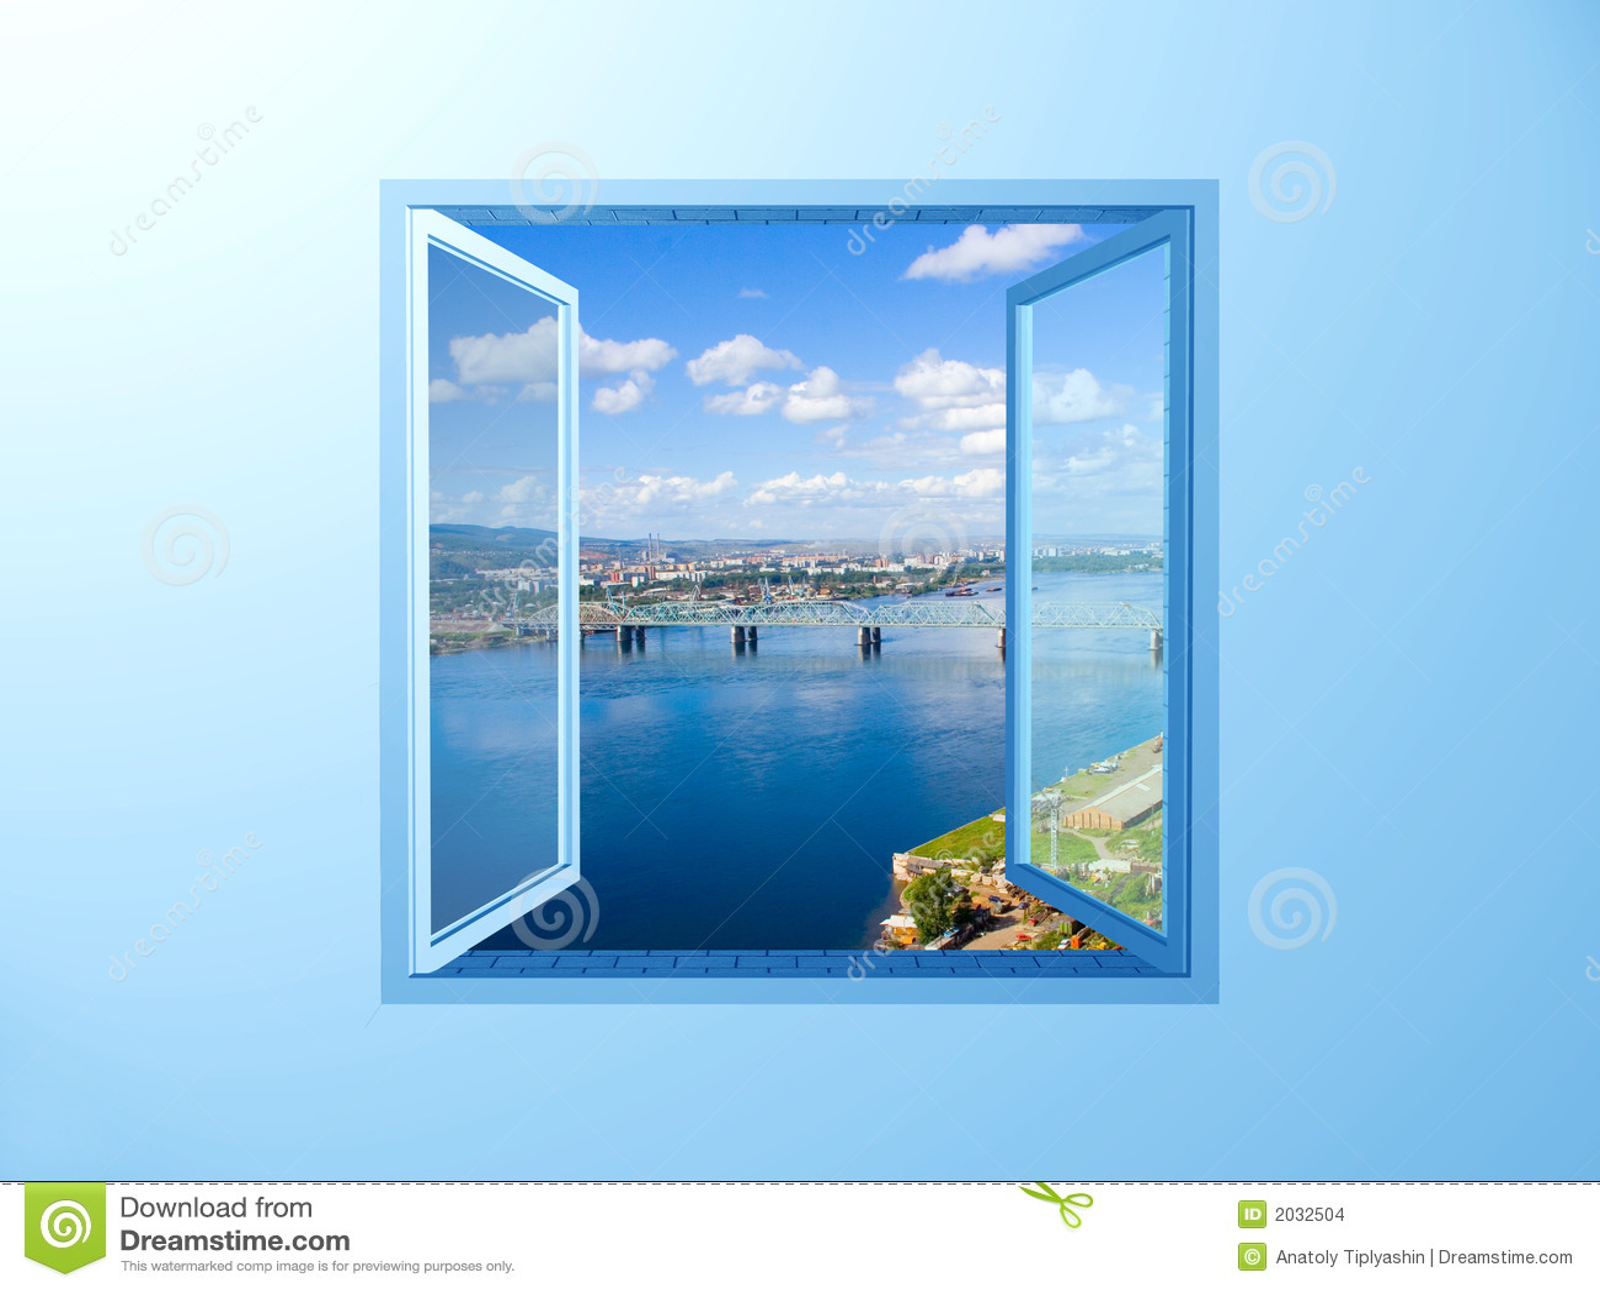 Window Blue Wall River